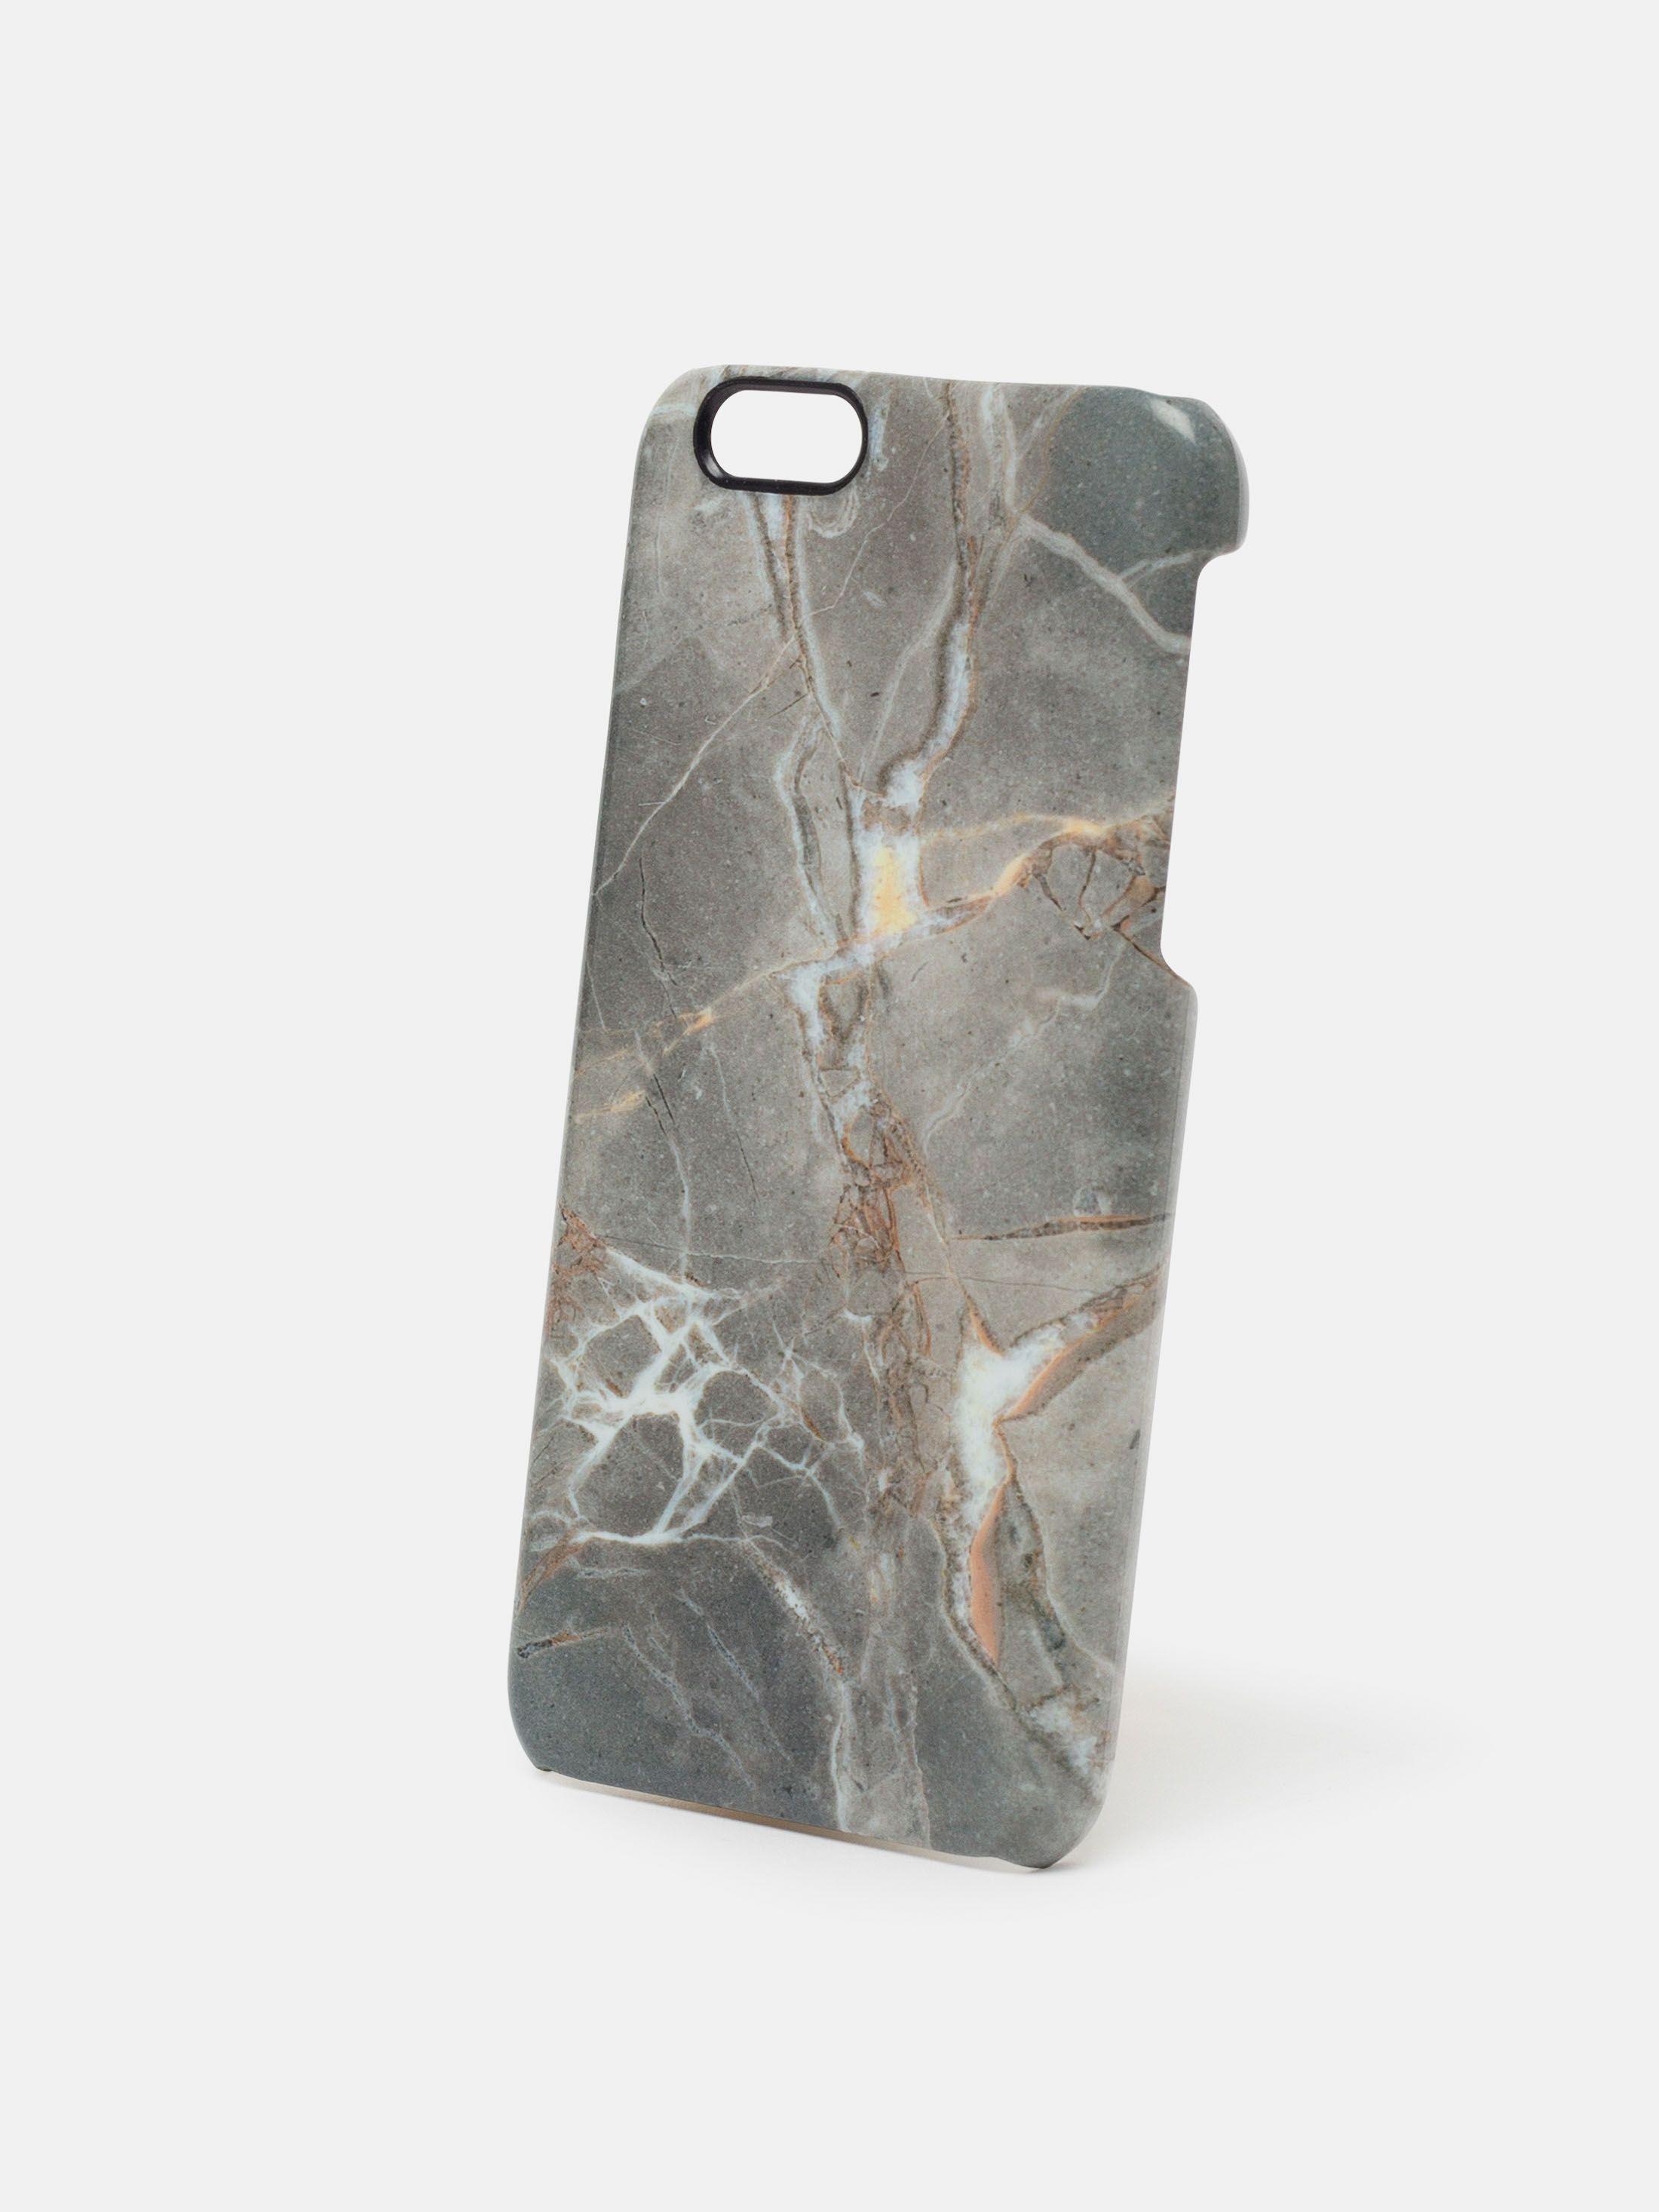 Coque pour iPhone 6/6+